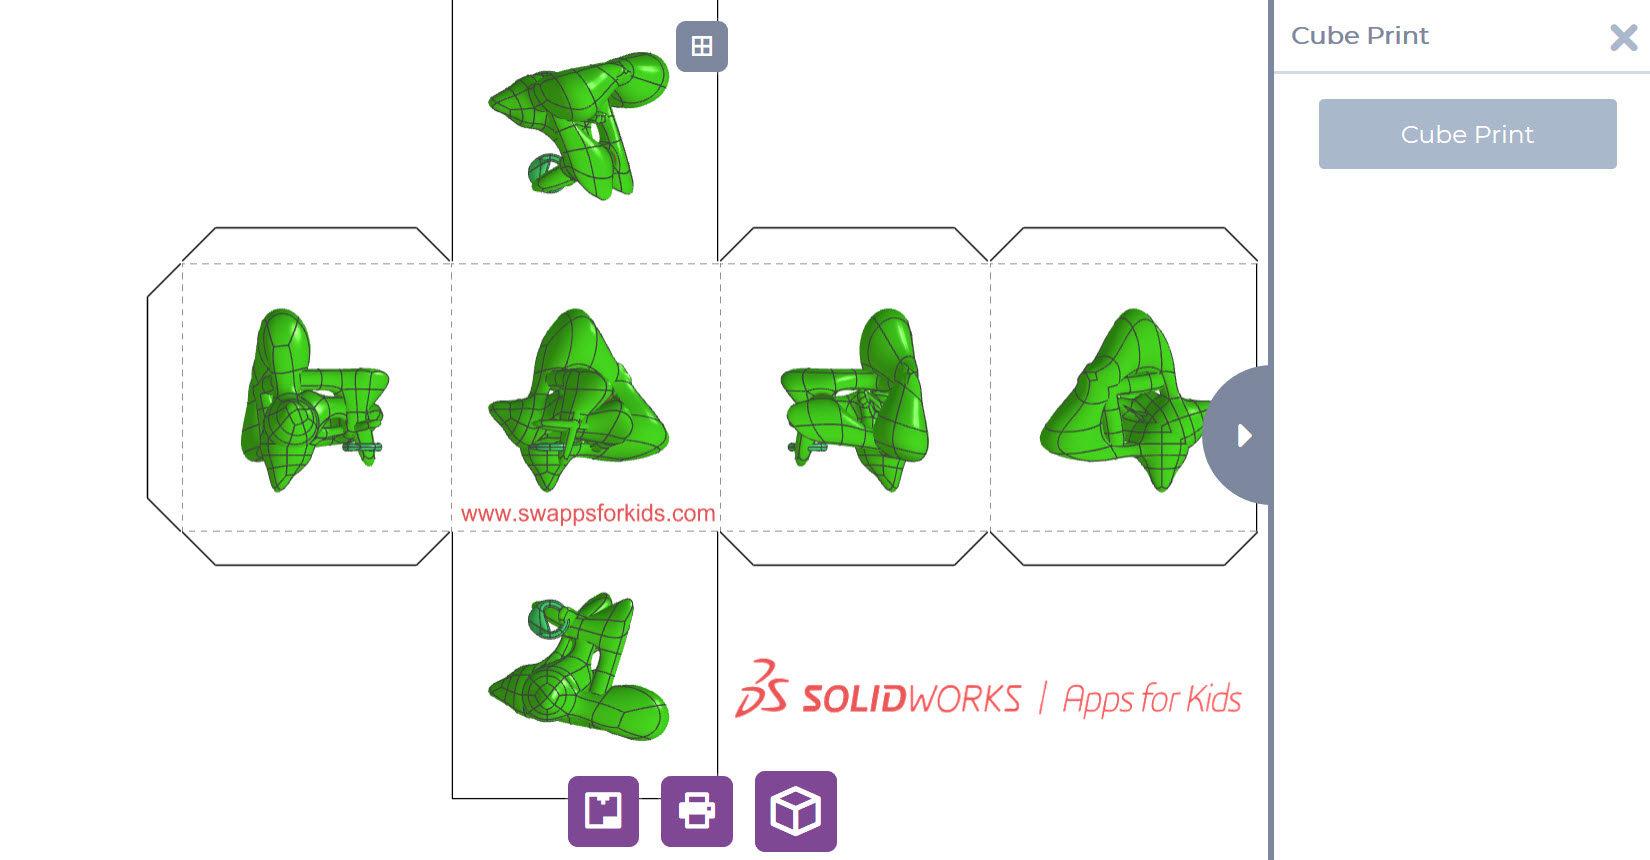 Cube-Print-1650x860.jpg